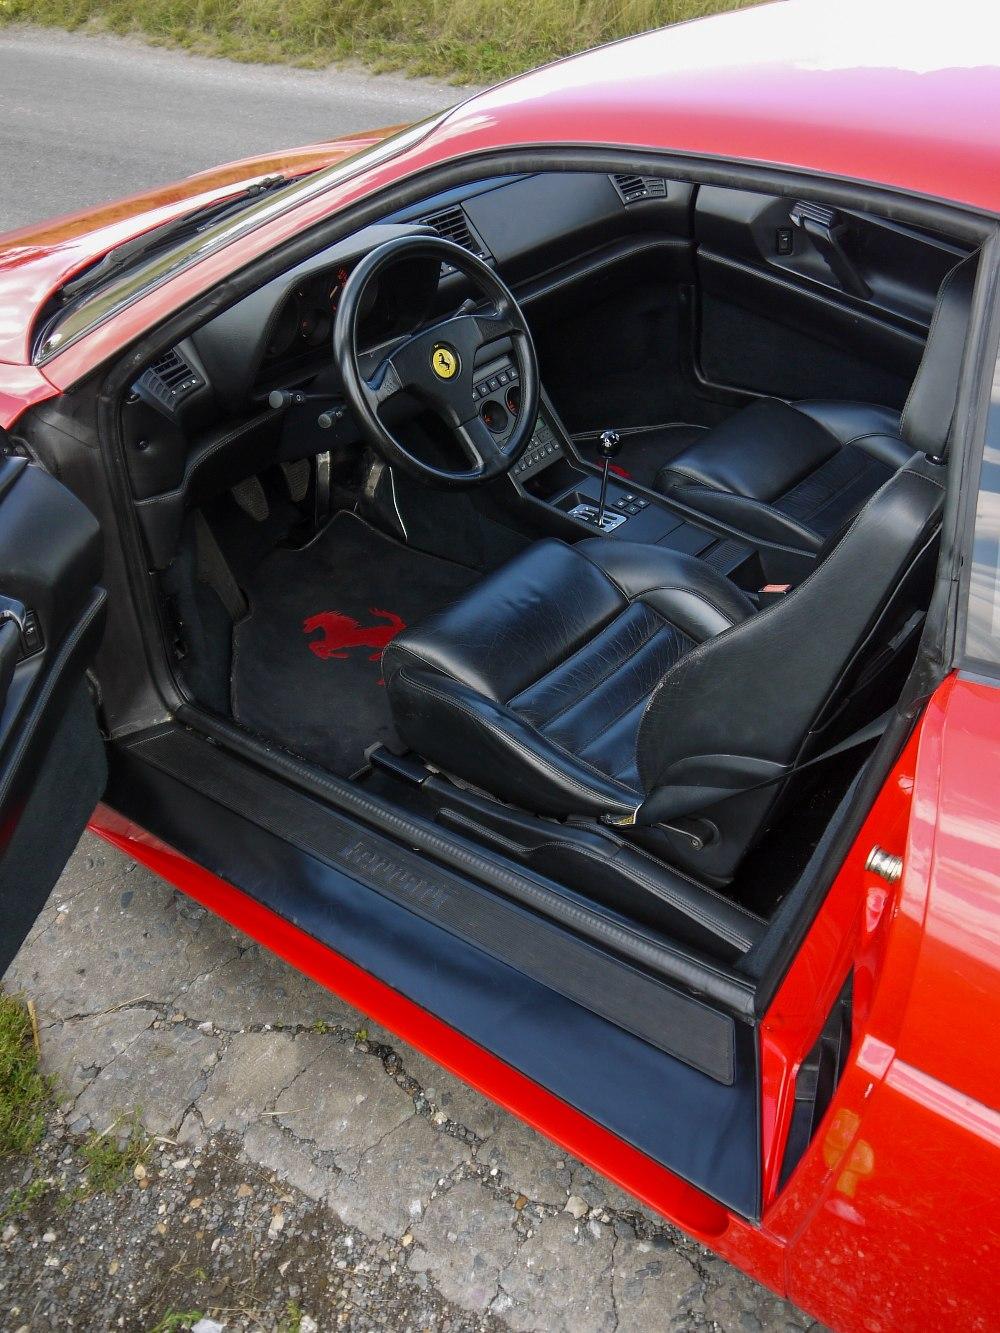 1993 FERRARI 348 TRASVERSALE BERLINETTA Registration Number: L796THC Chassis Number: - Image 20 of 49